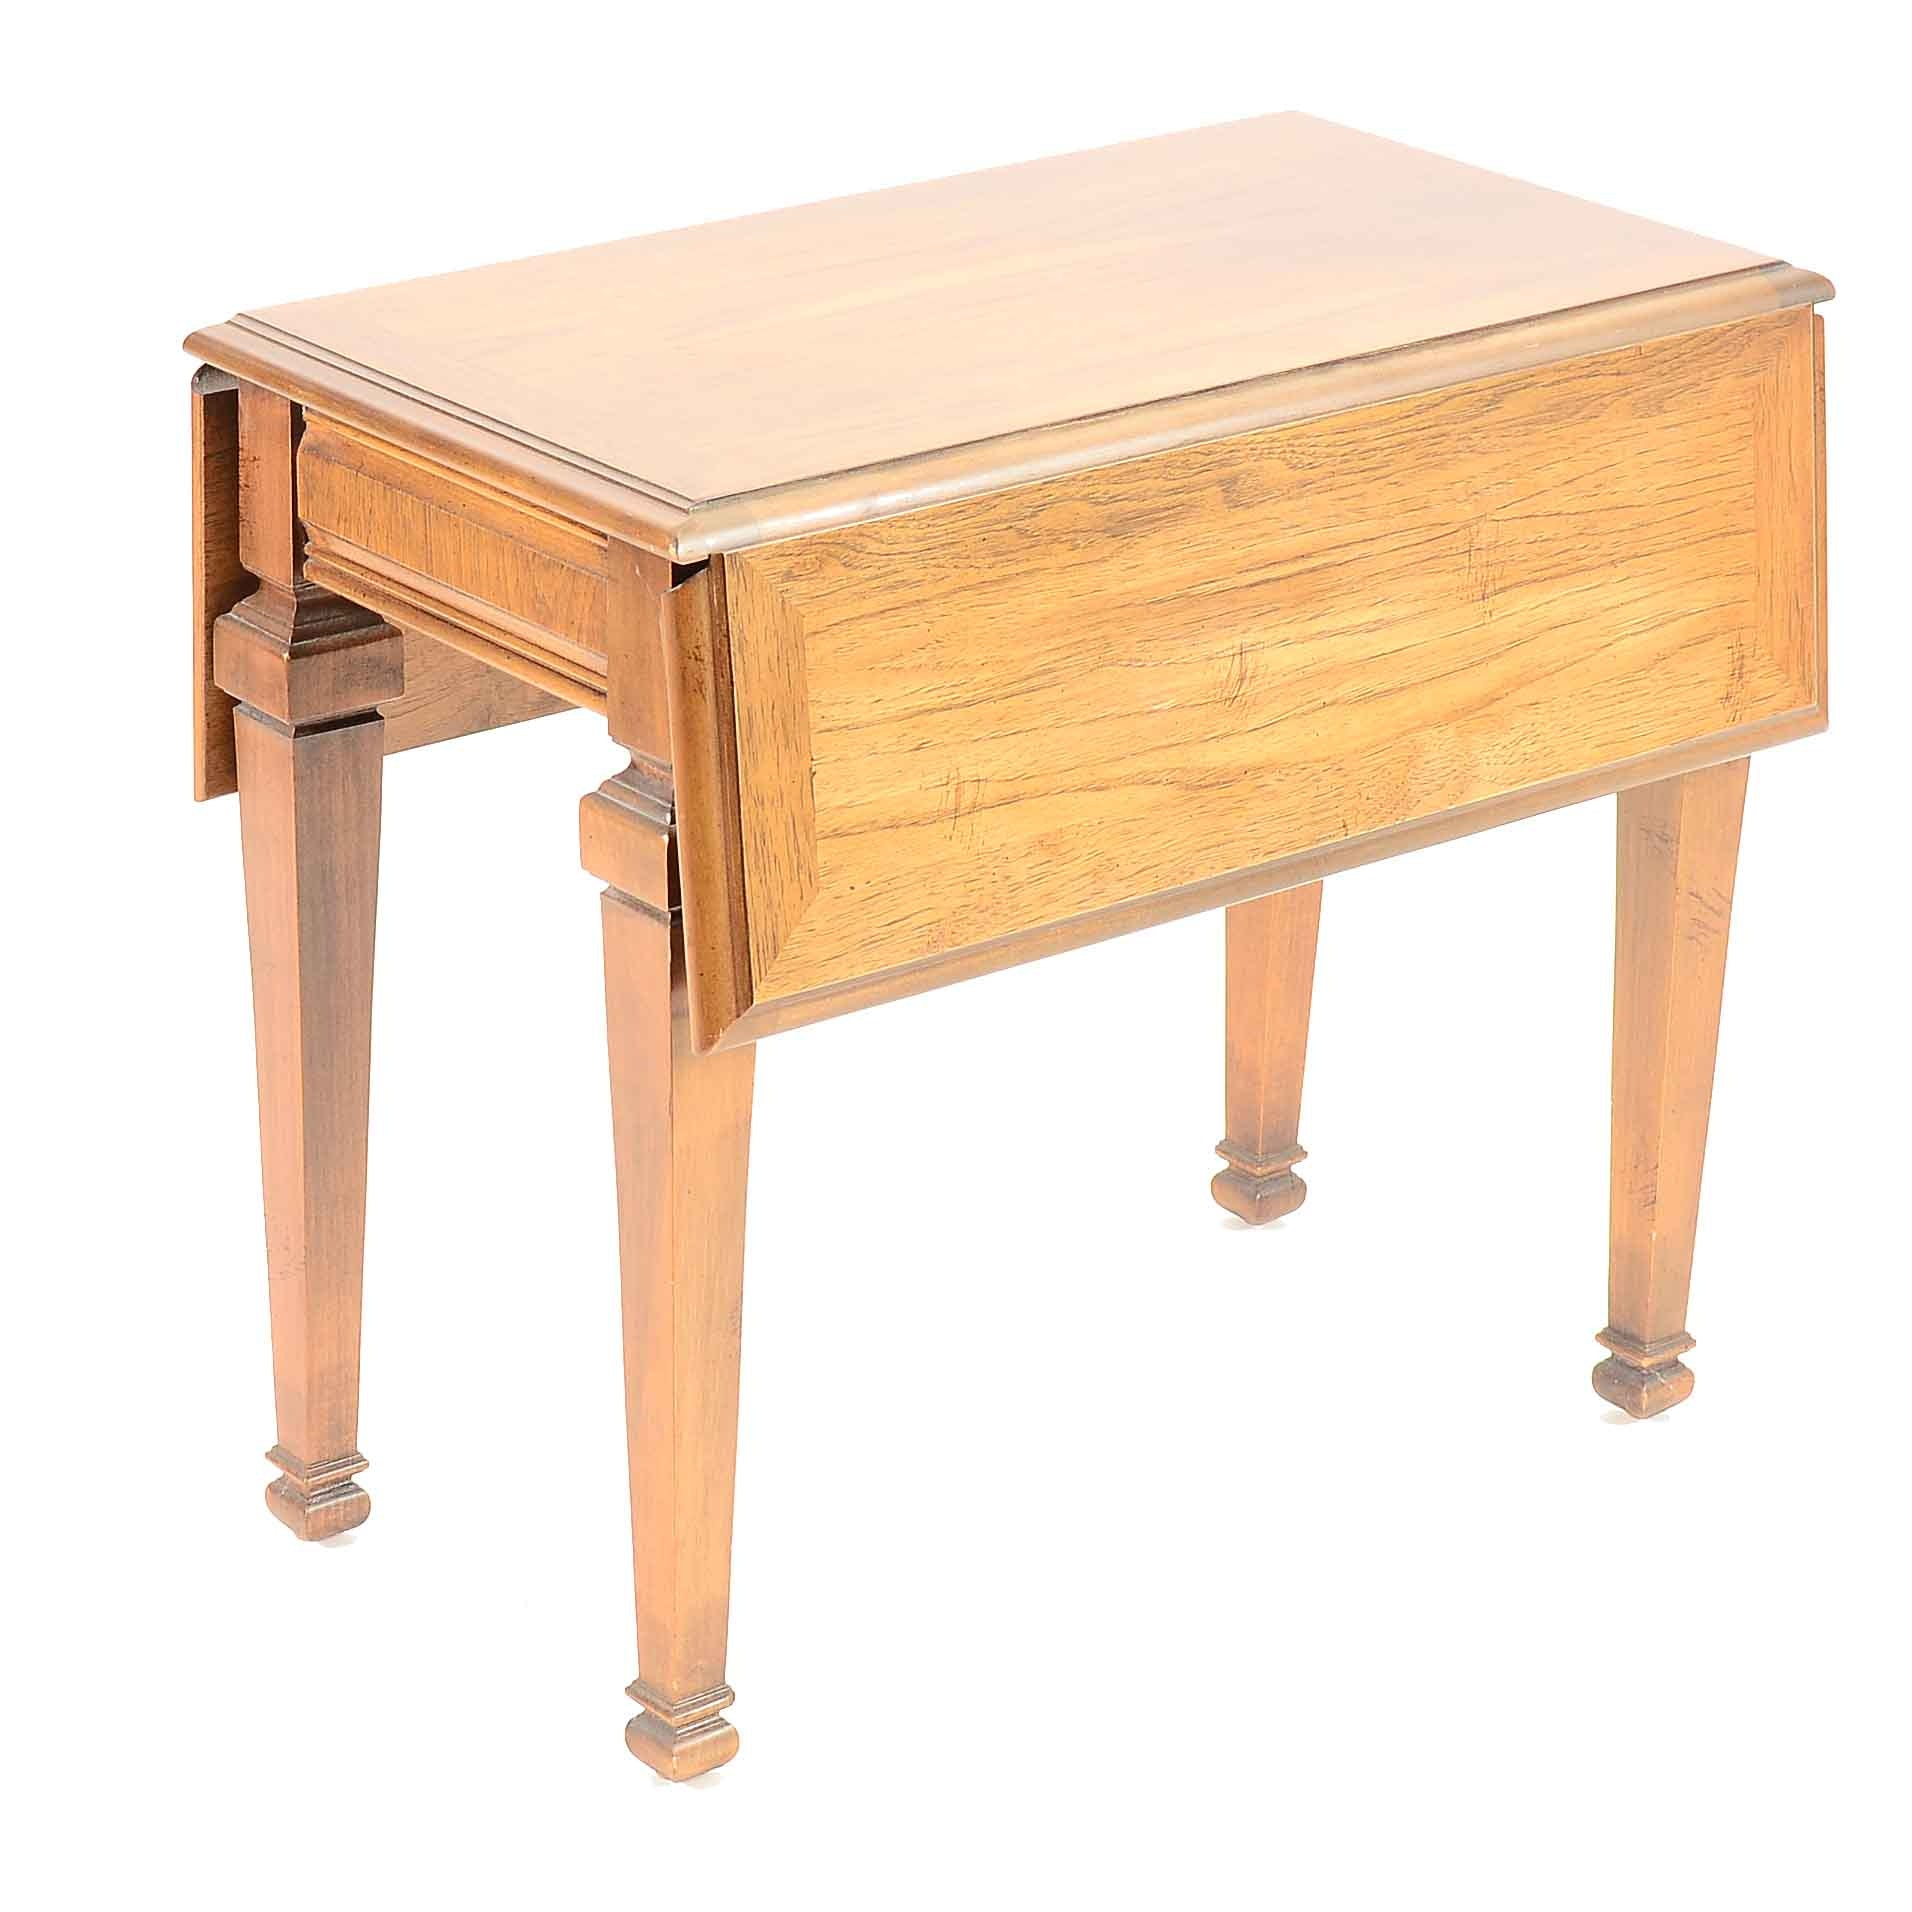 Pecan Drop-Leaf End Table by Lane